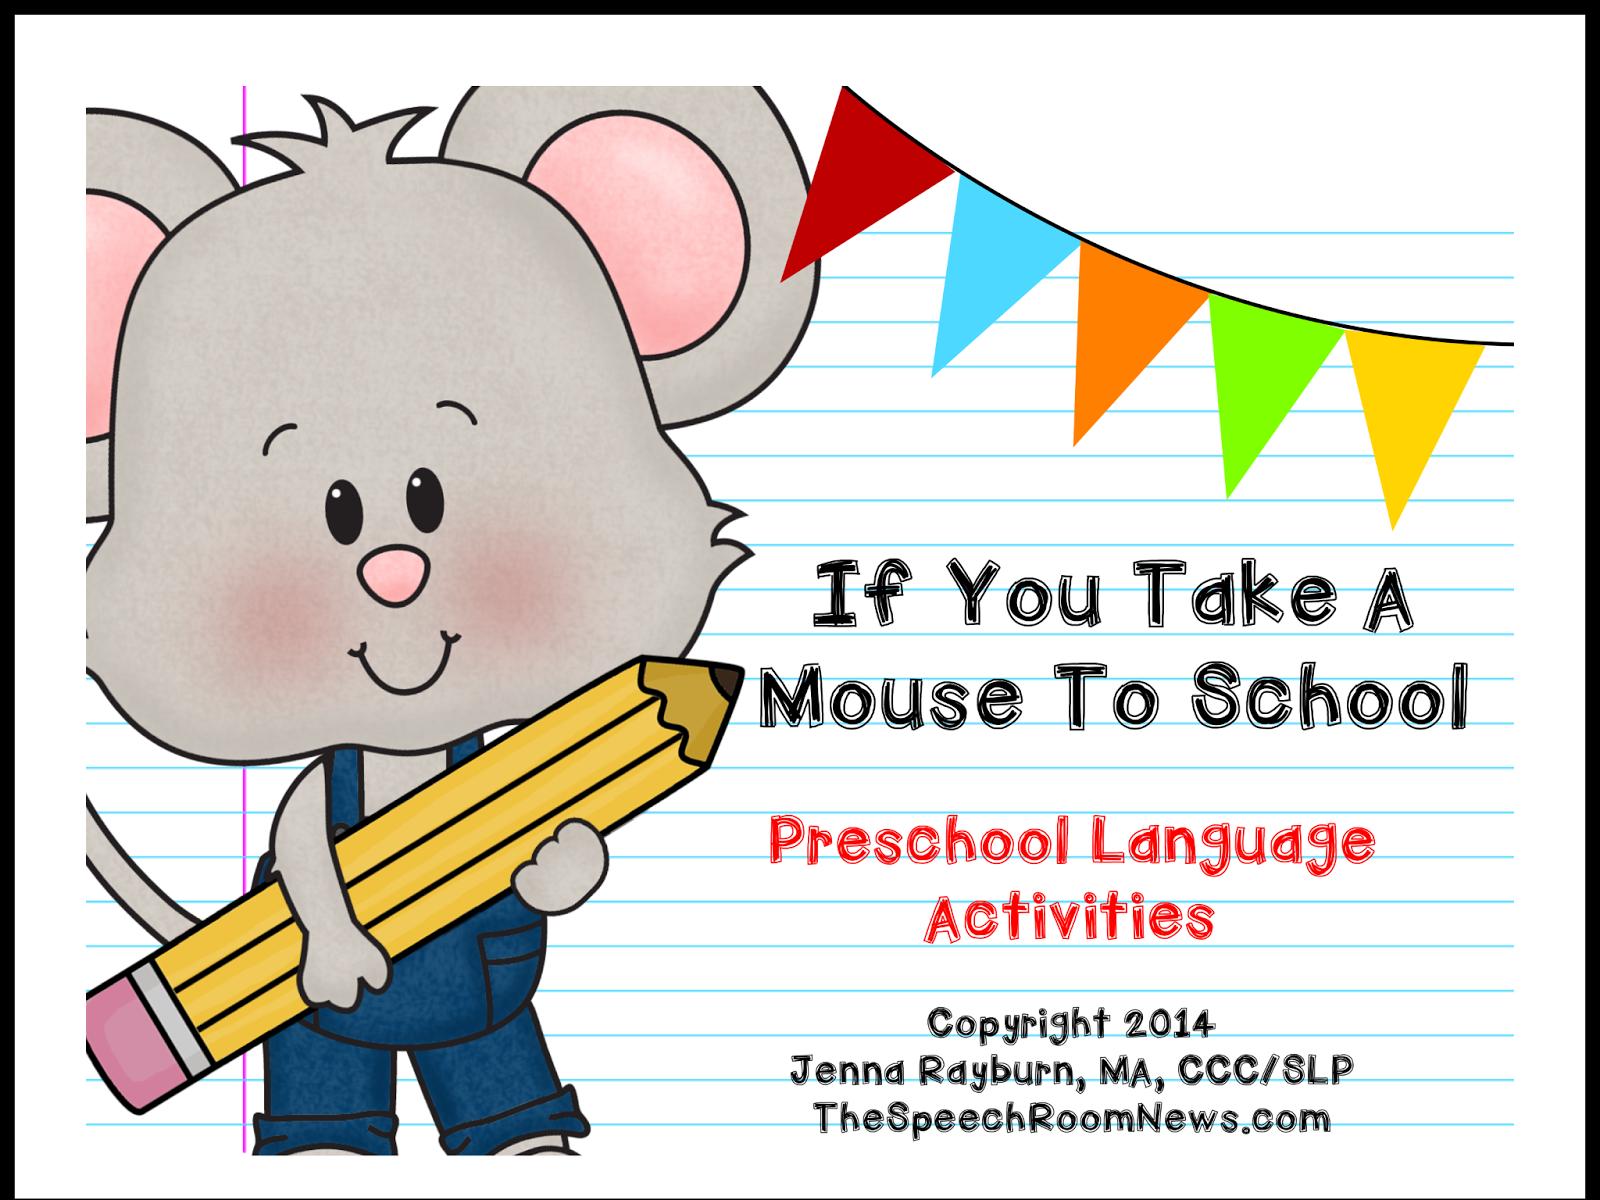 http://www.teacherspayteachers.com/Product/Take-A-Mouse-to-School-Preschool-Book-Companion-1340562